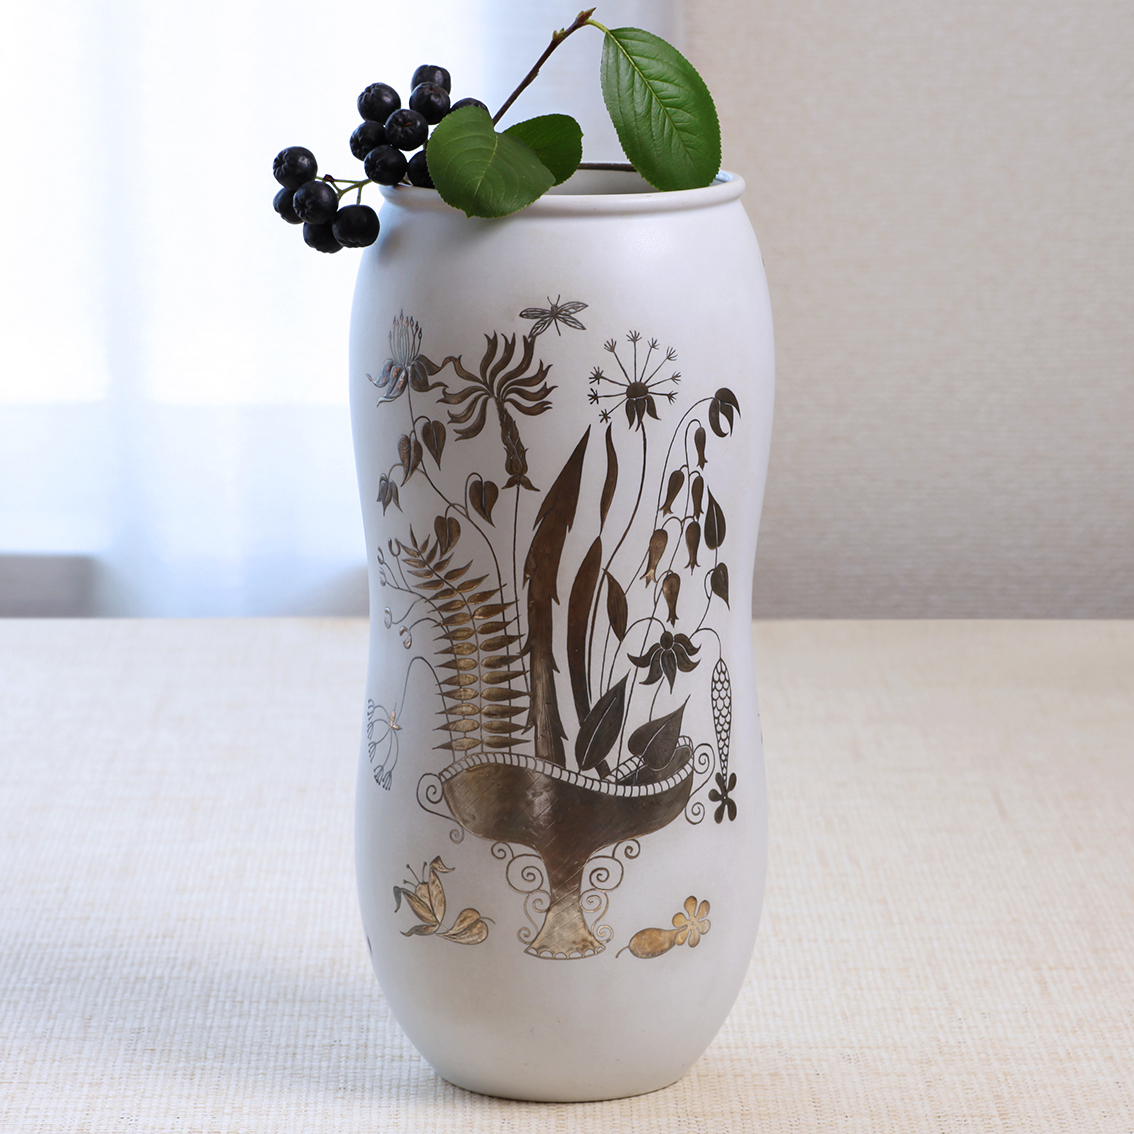 Gustavsberg  Fajans ファイアンス グスタフスベリ Grazia グロッツィア 花瓶 フラワーベース 北欧ヴィンテージ